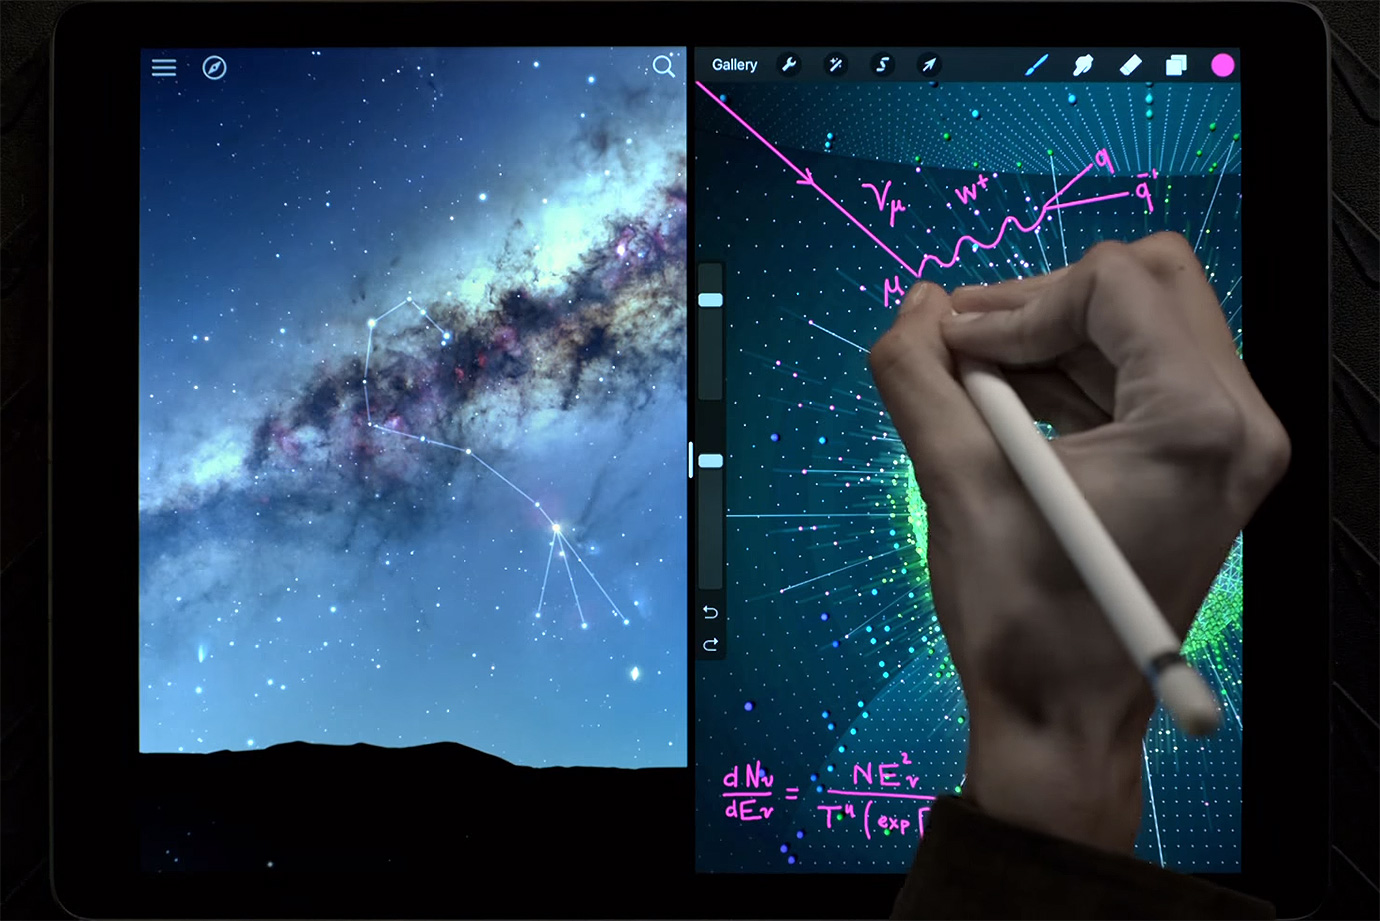 Explore the Universe With Apple's iPad Pro